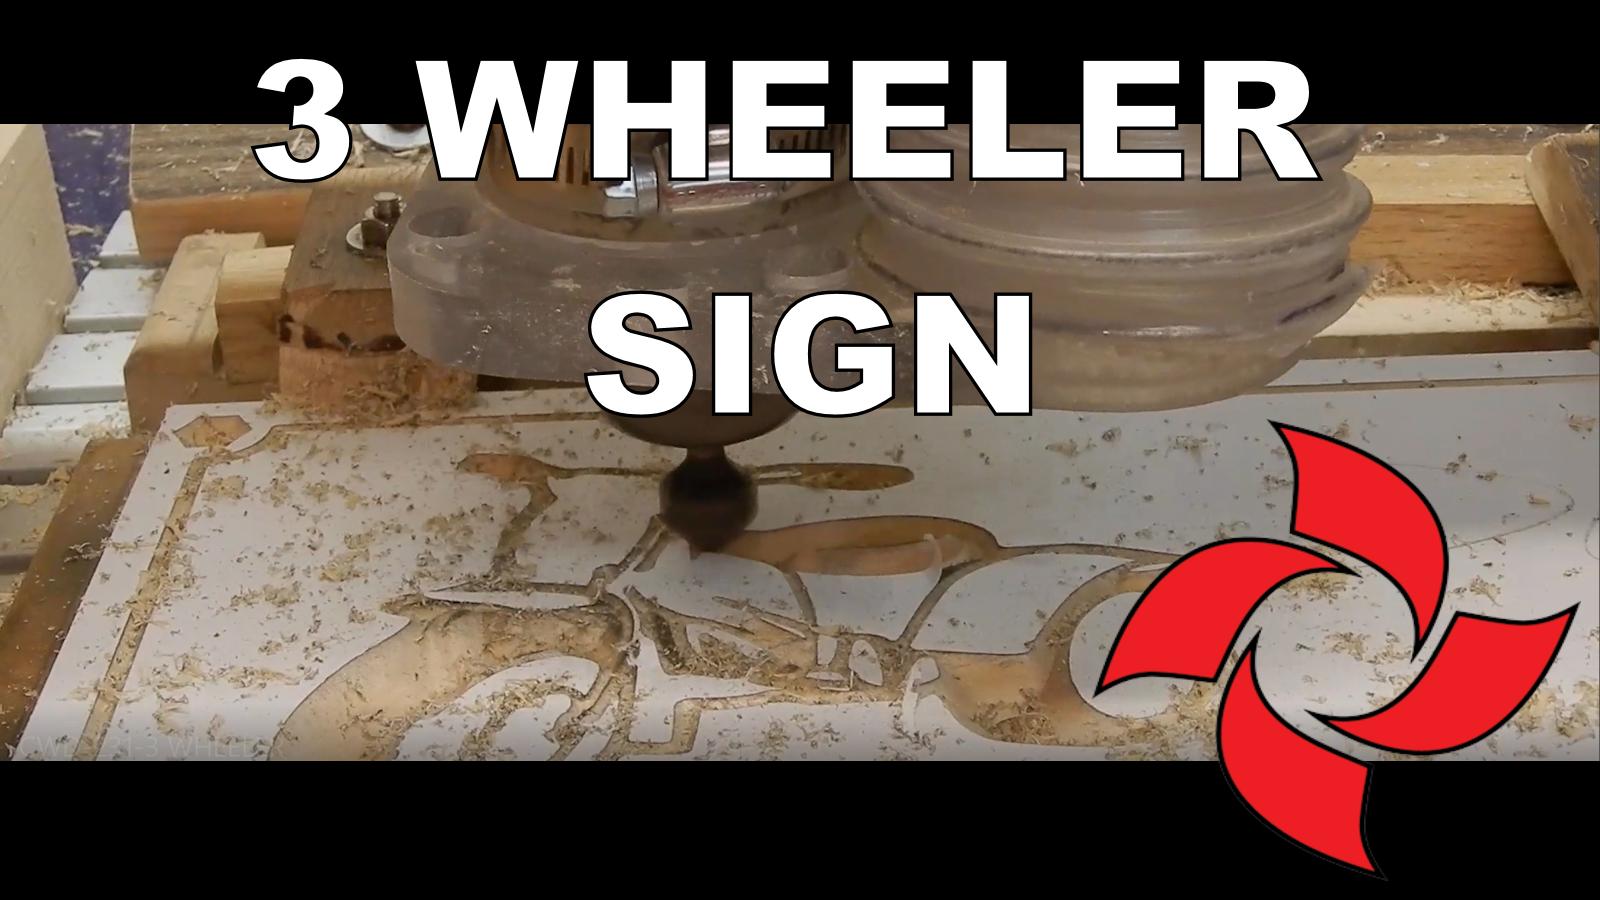 3 wheeler garage sign